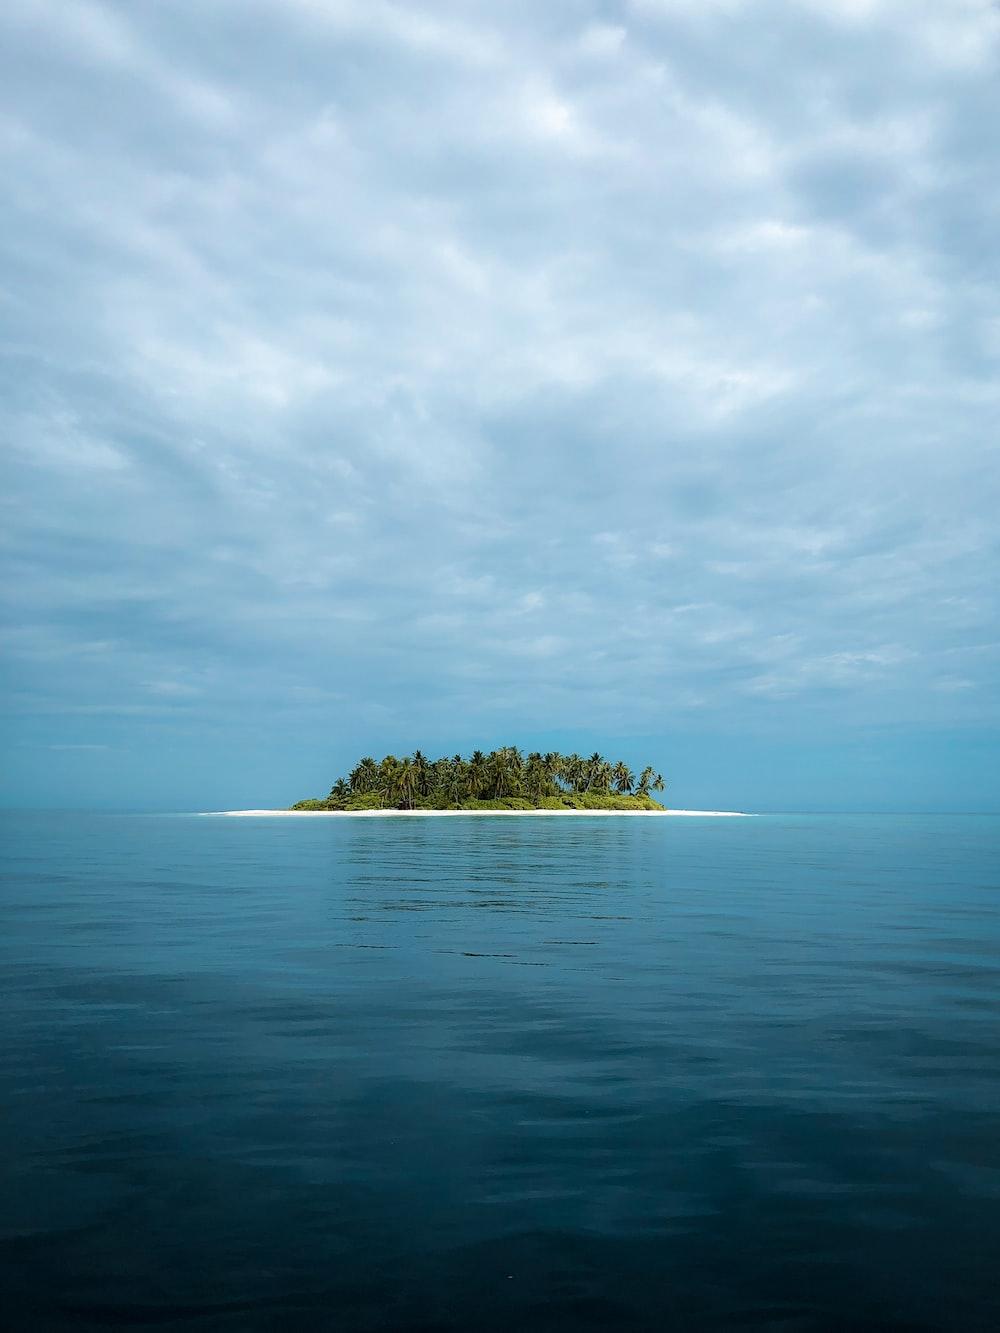 green islet